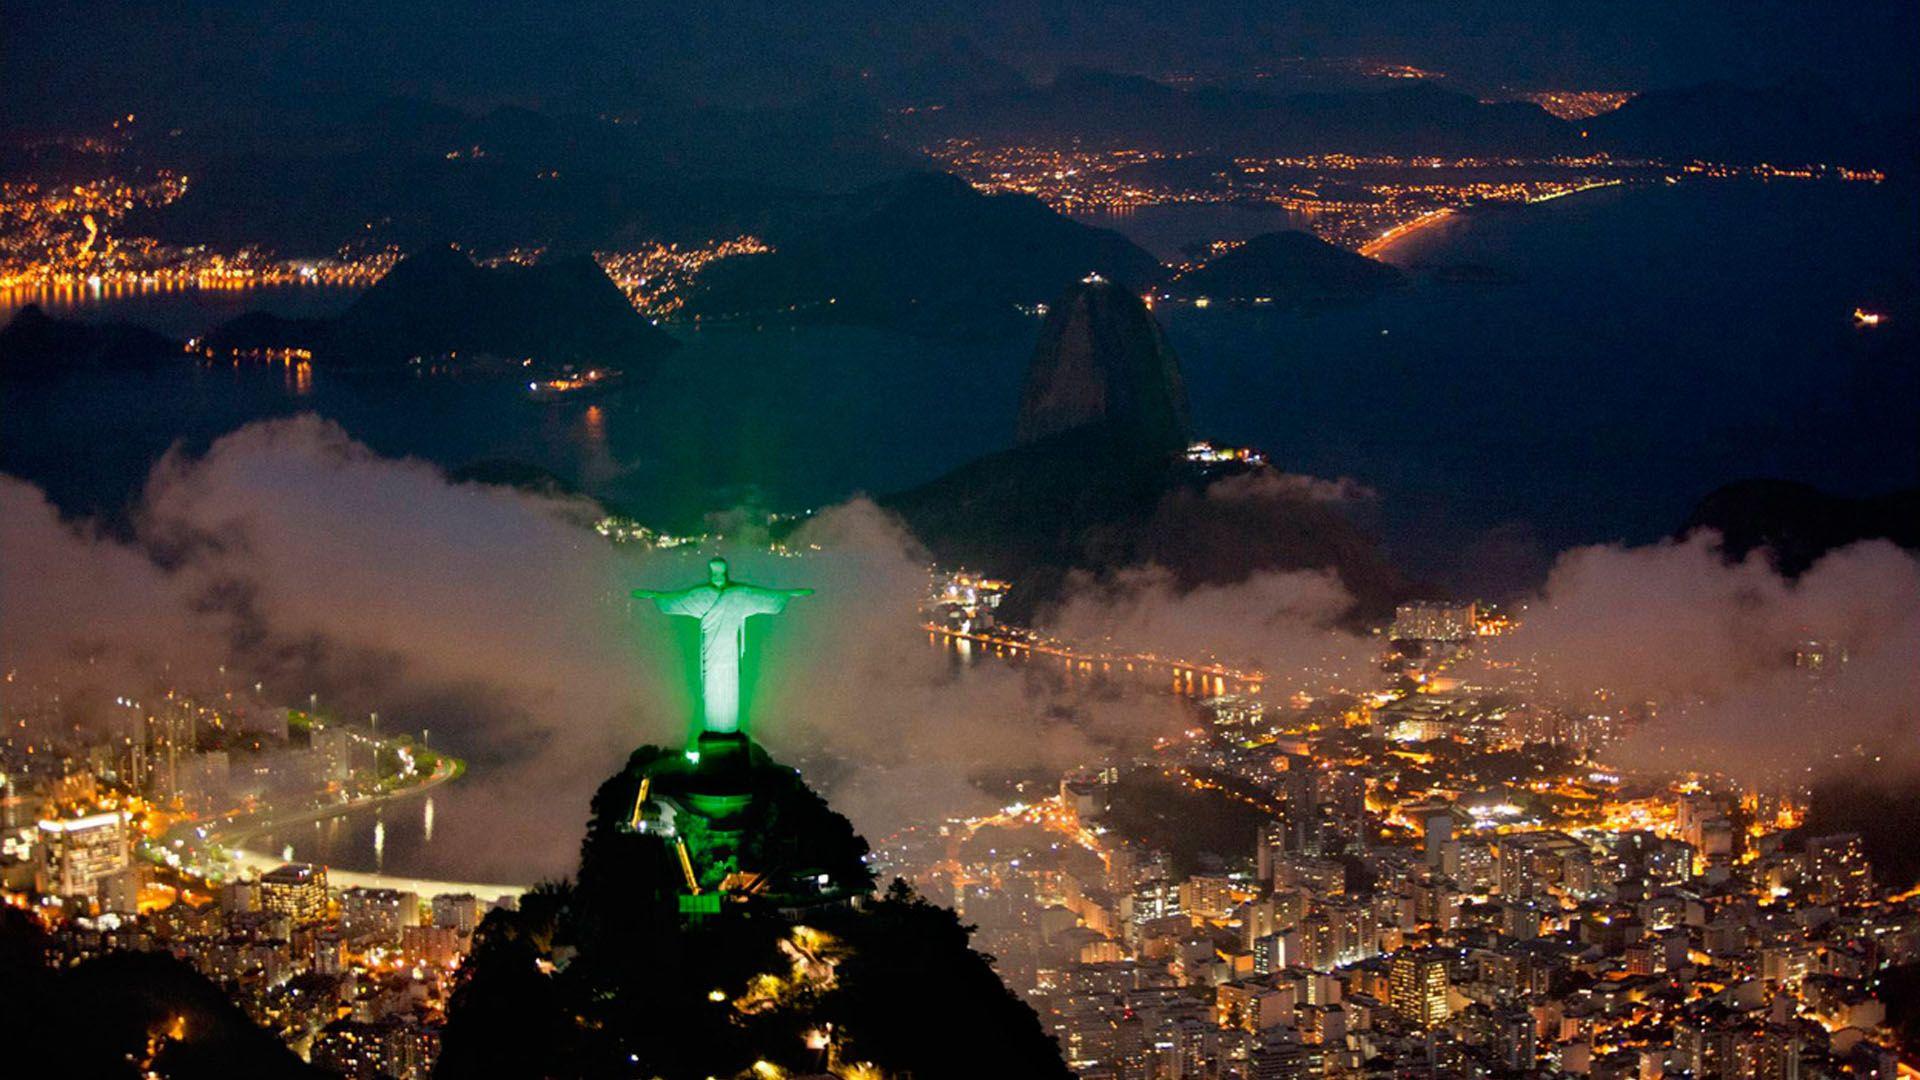 Hd wallpaper travel - Image For Jesus Statue In Brazil Struck By Lightning Hd Wallpaper